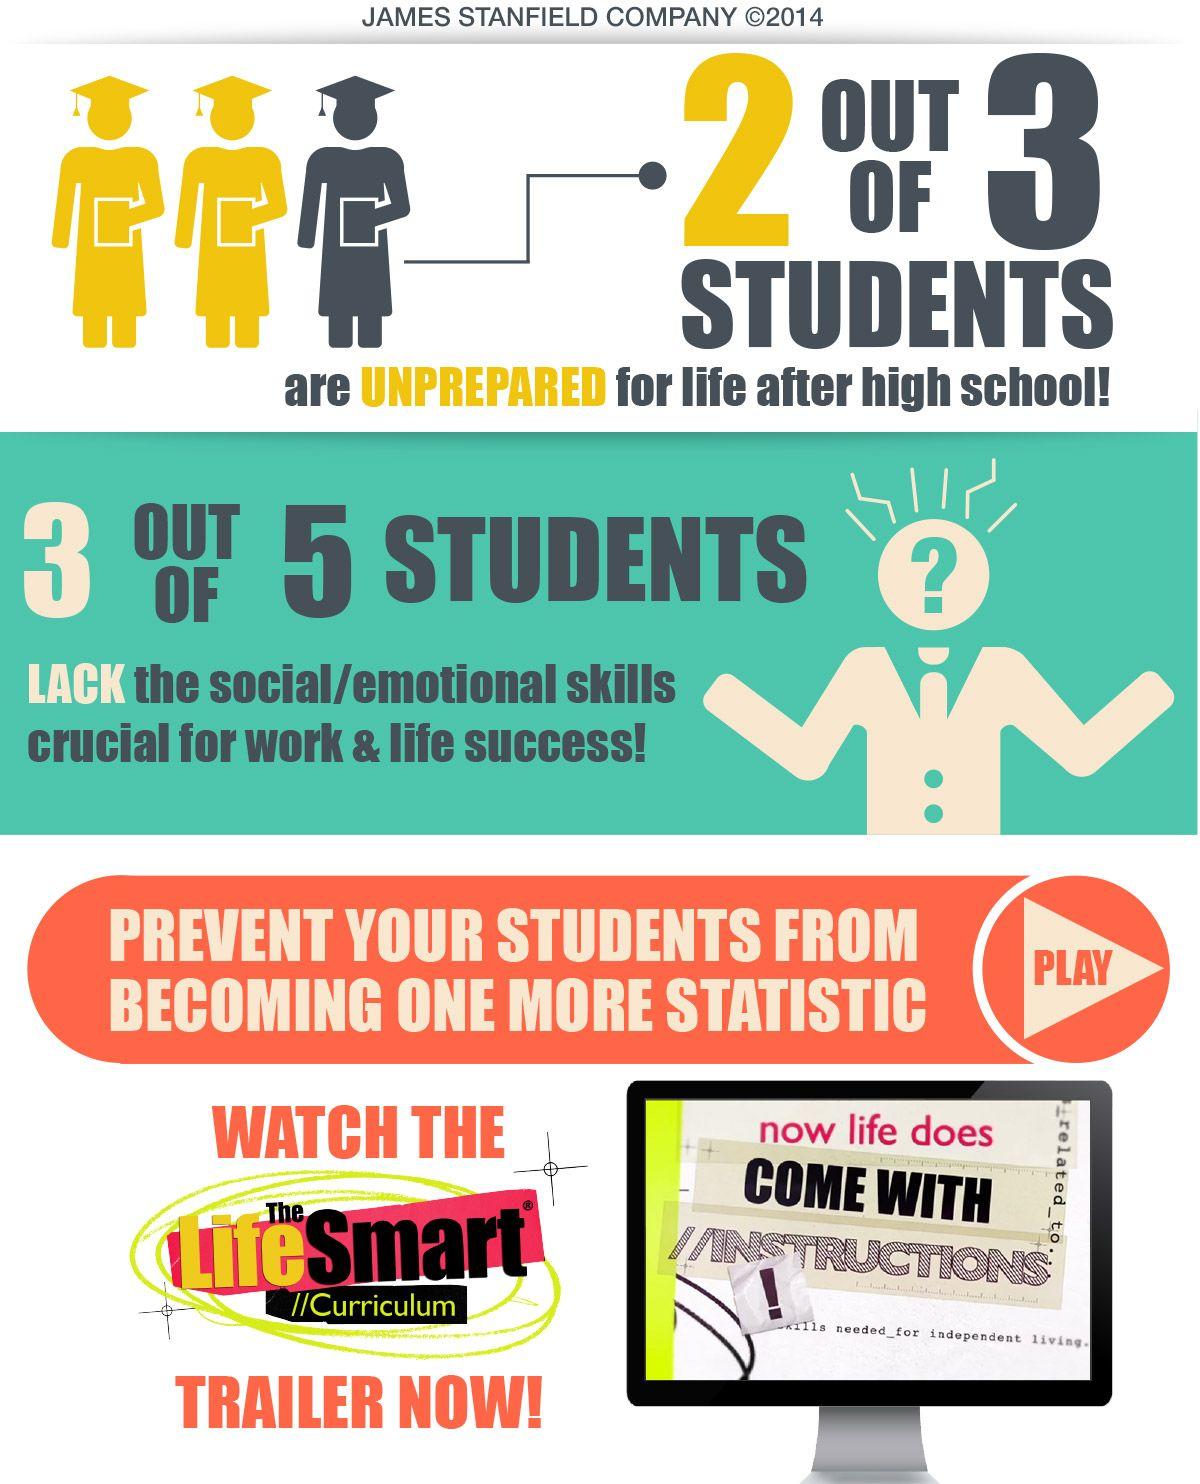 The Lifesmart Curriculum James Stanfield Company Life Skills Lessons High School Life Life Skills